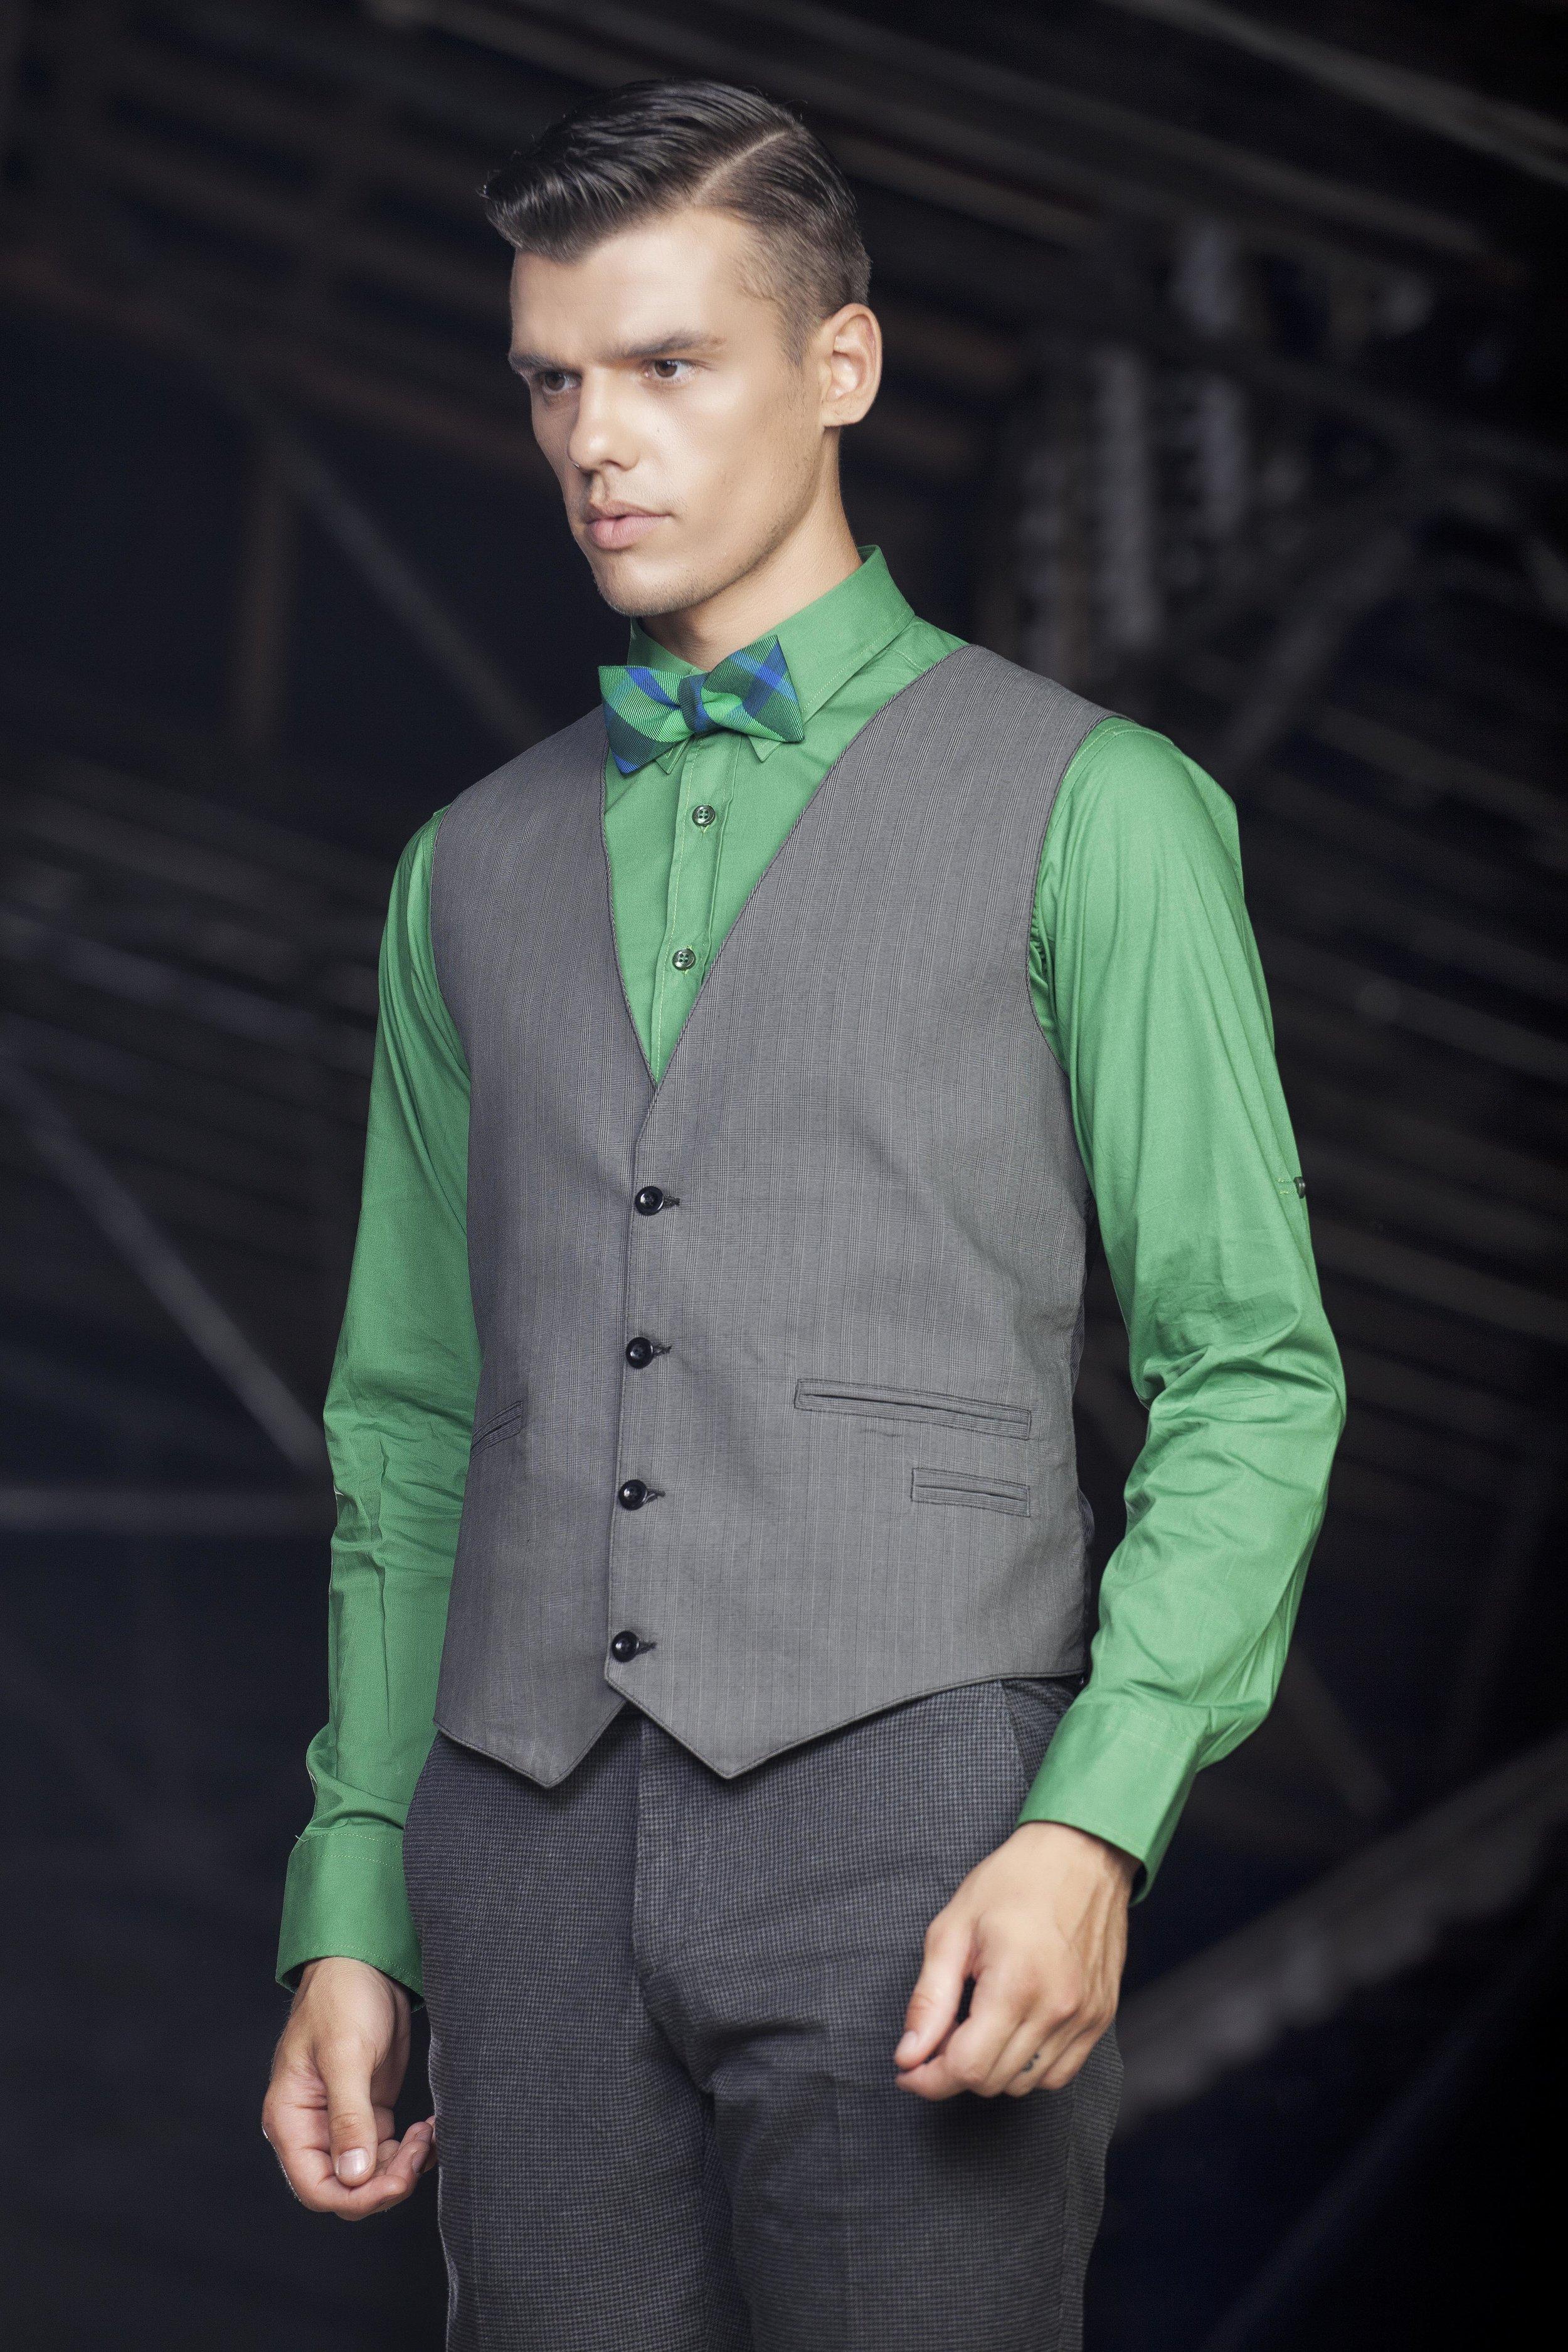 Ugur_Bektas_Fashion_Moda_fotograf_Set_7_008.jpg